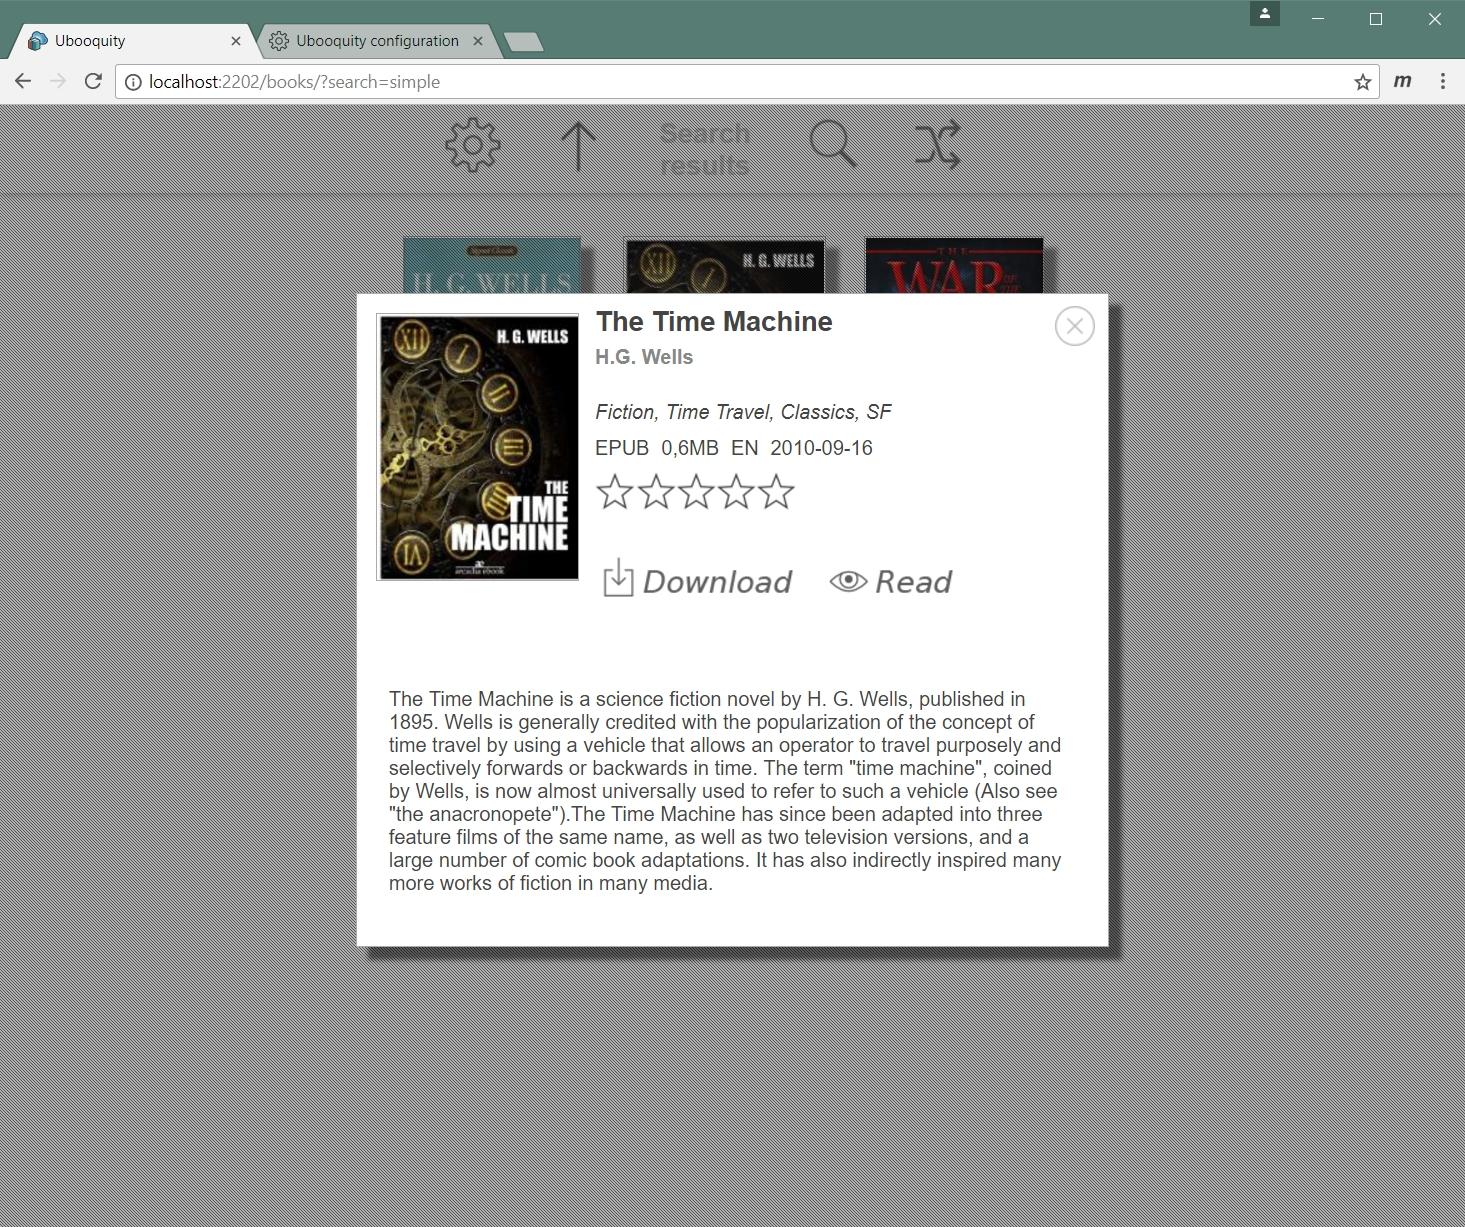 [Imagen: 04_library_-book_details-.jpg]